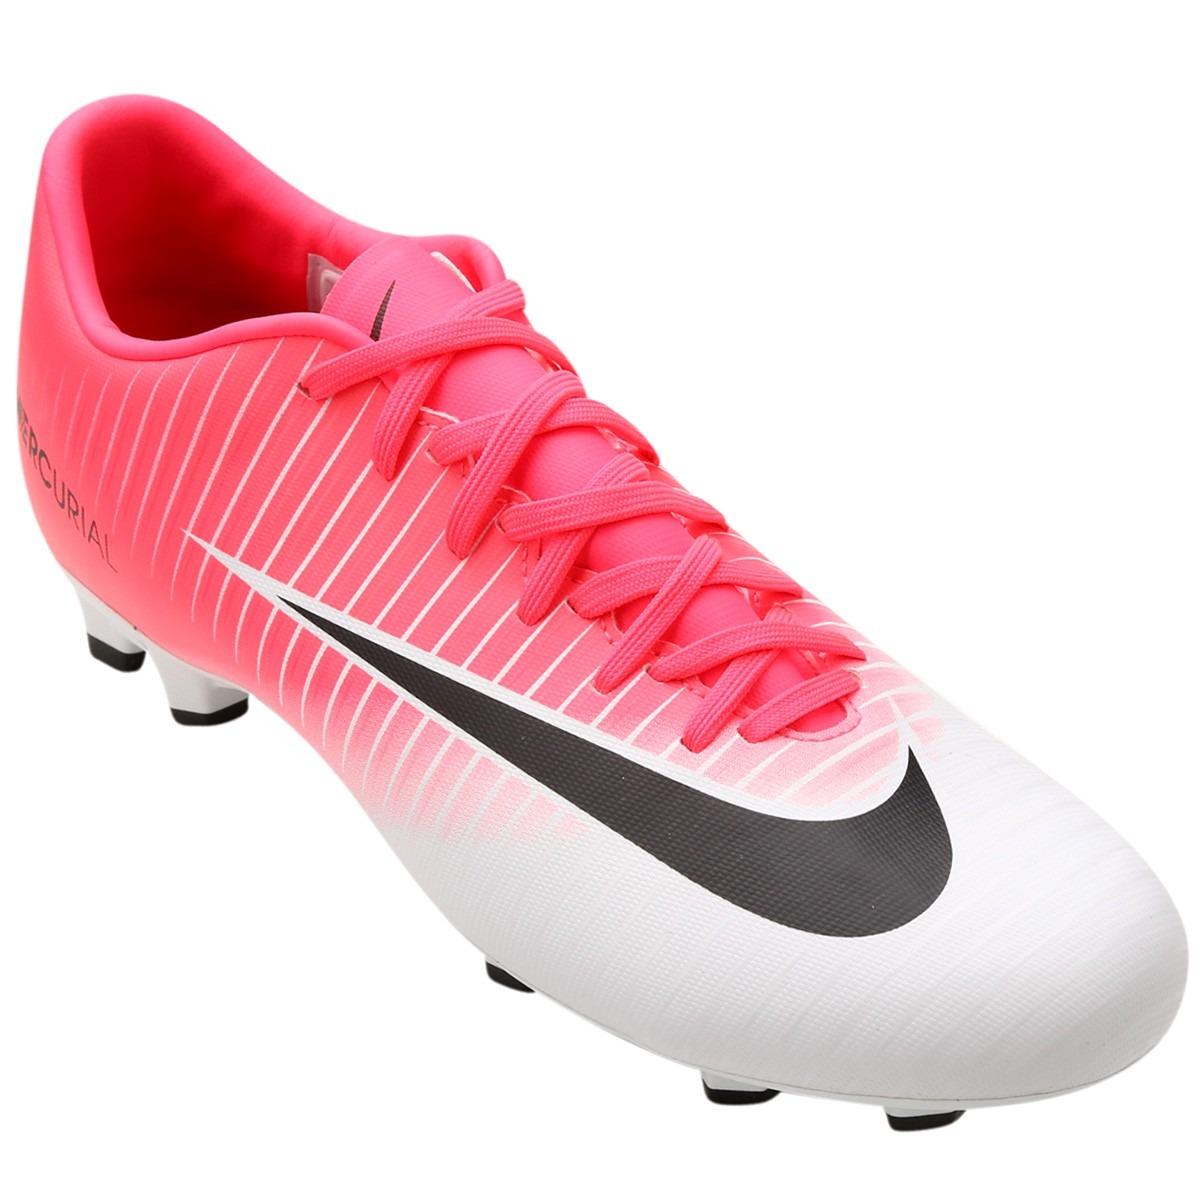 6f5ae01866b92 Chuteira Campo Nike Mercurial Fg 831964-006